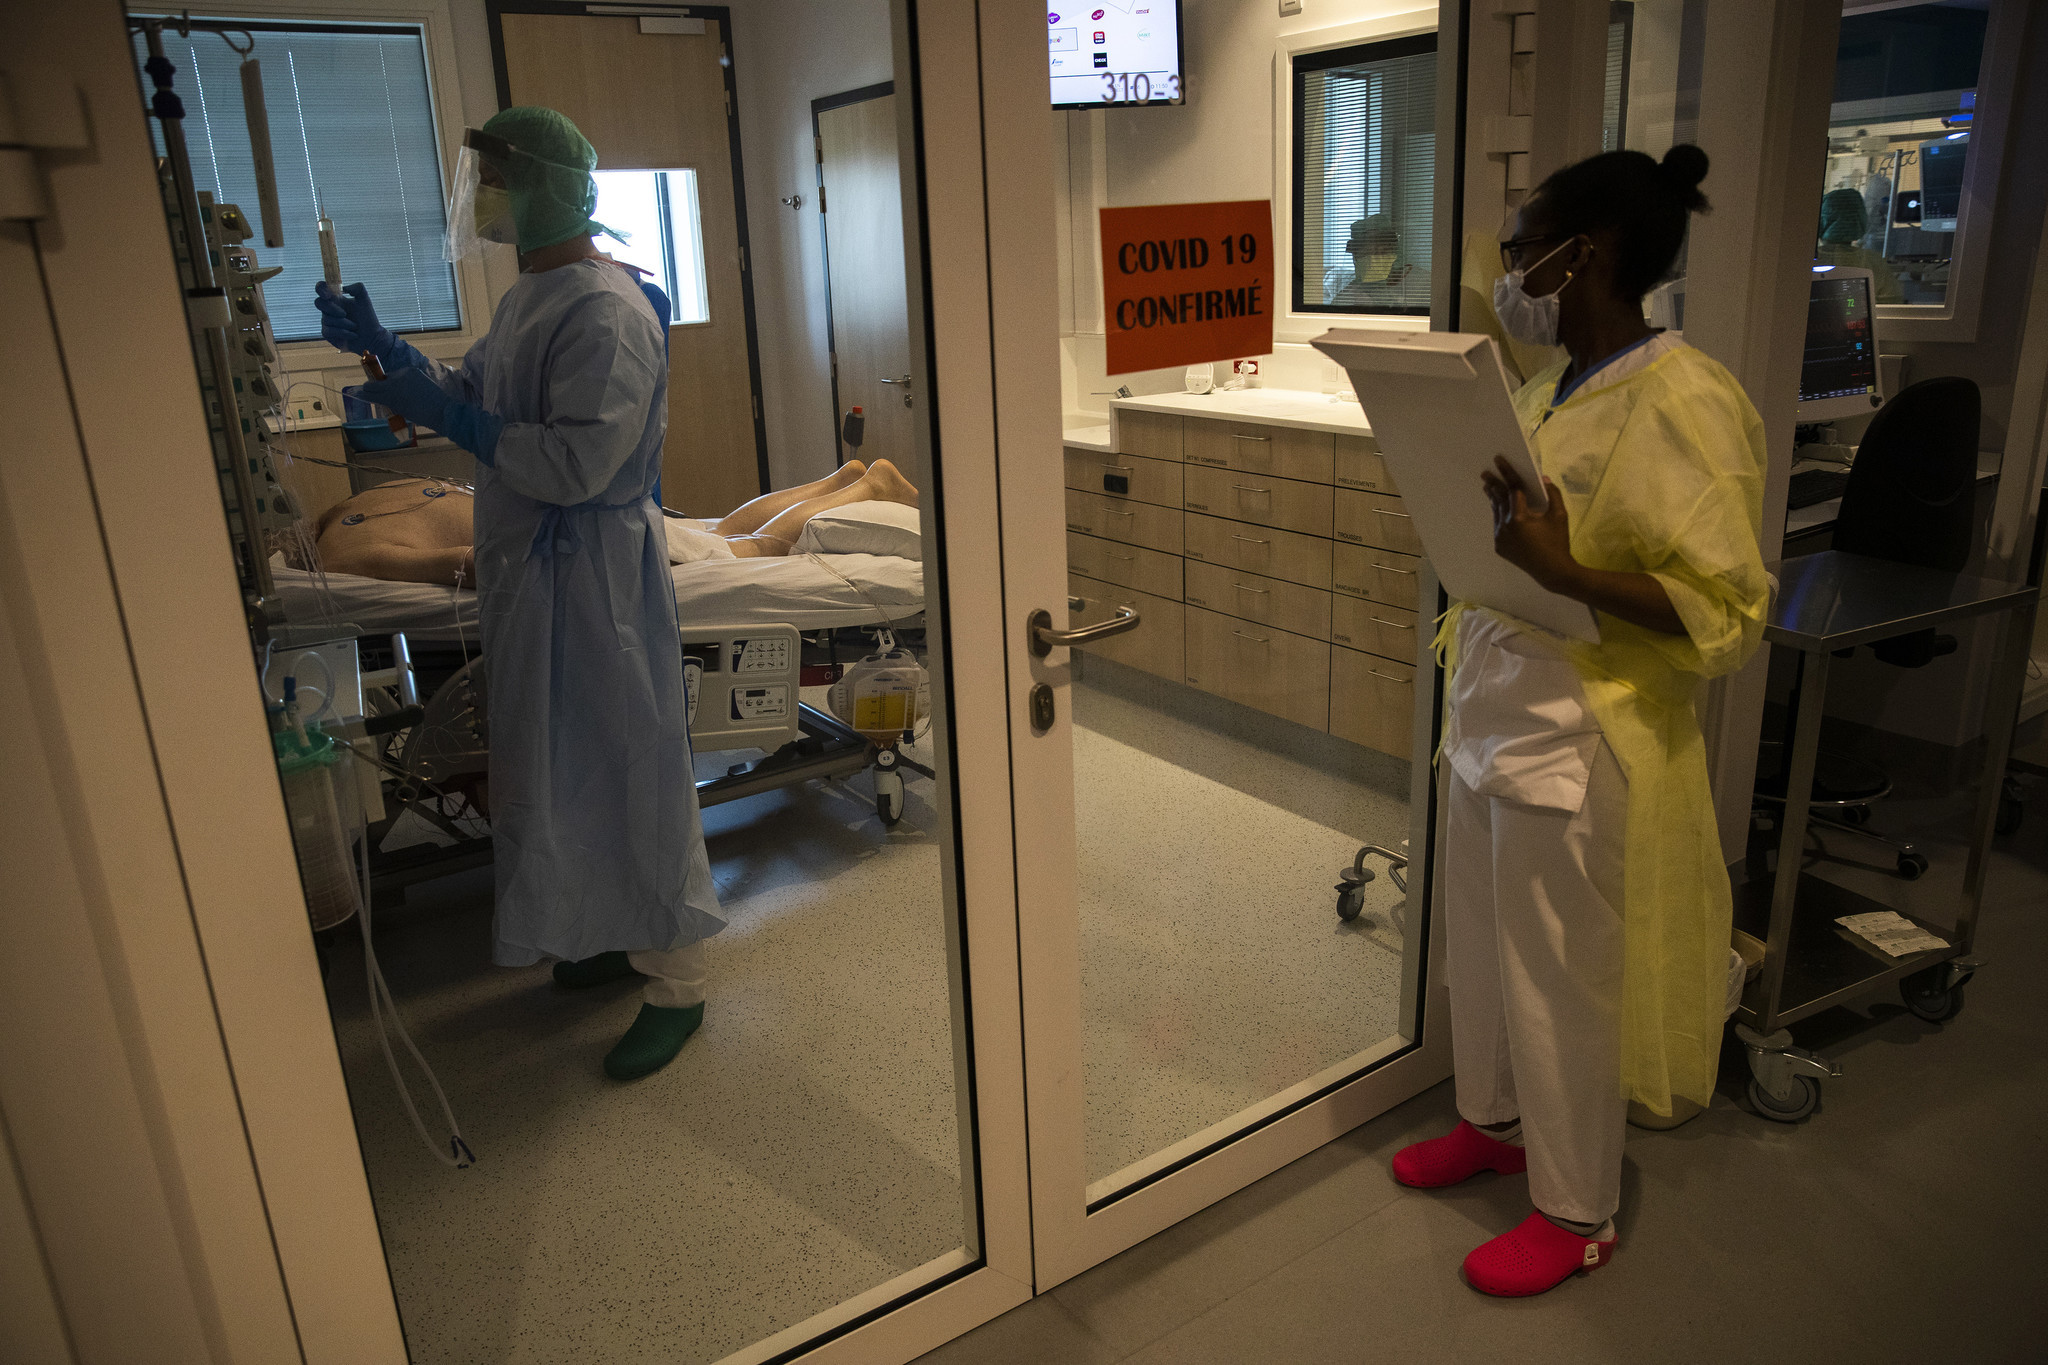 Belgian girl, 12, becomes Europe's youngest known coronavirus victim